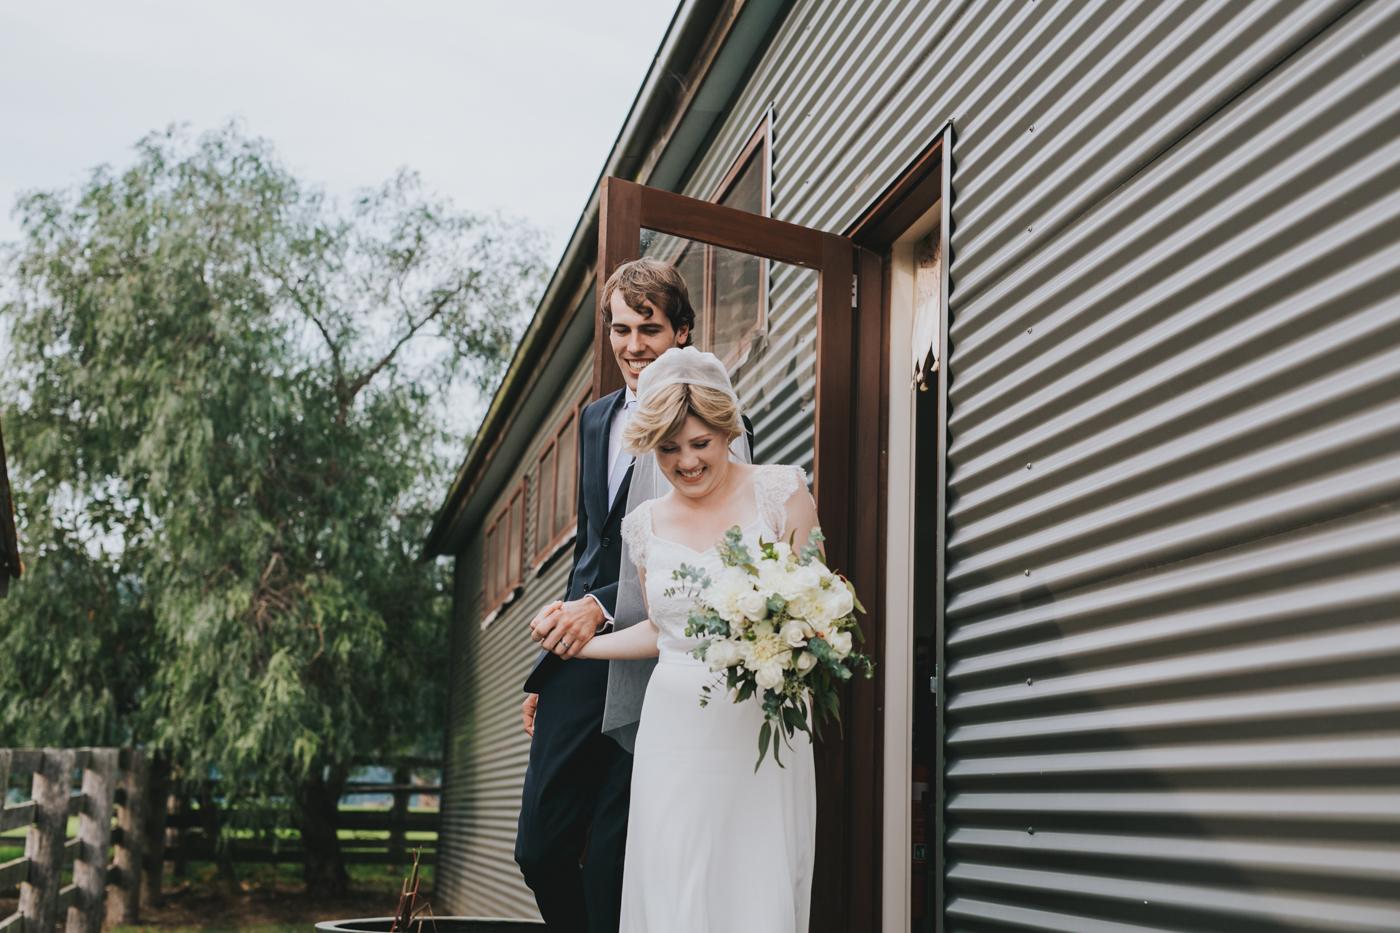 Rachel & Jacob - Willow Farm Berry - South Coast Wedding - Samantha Heather Photography-86.jpg